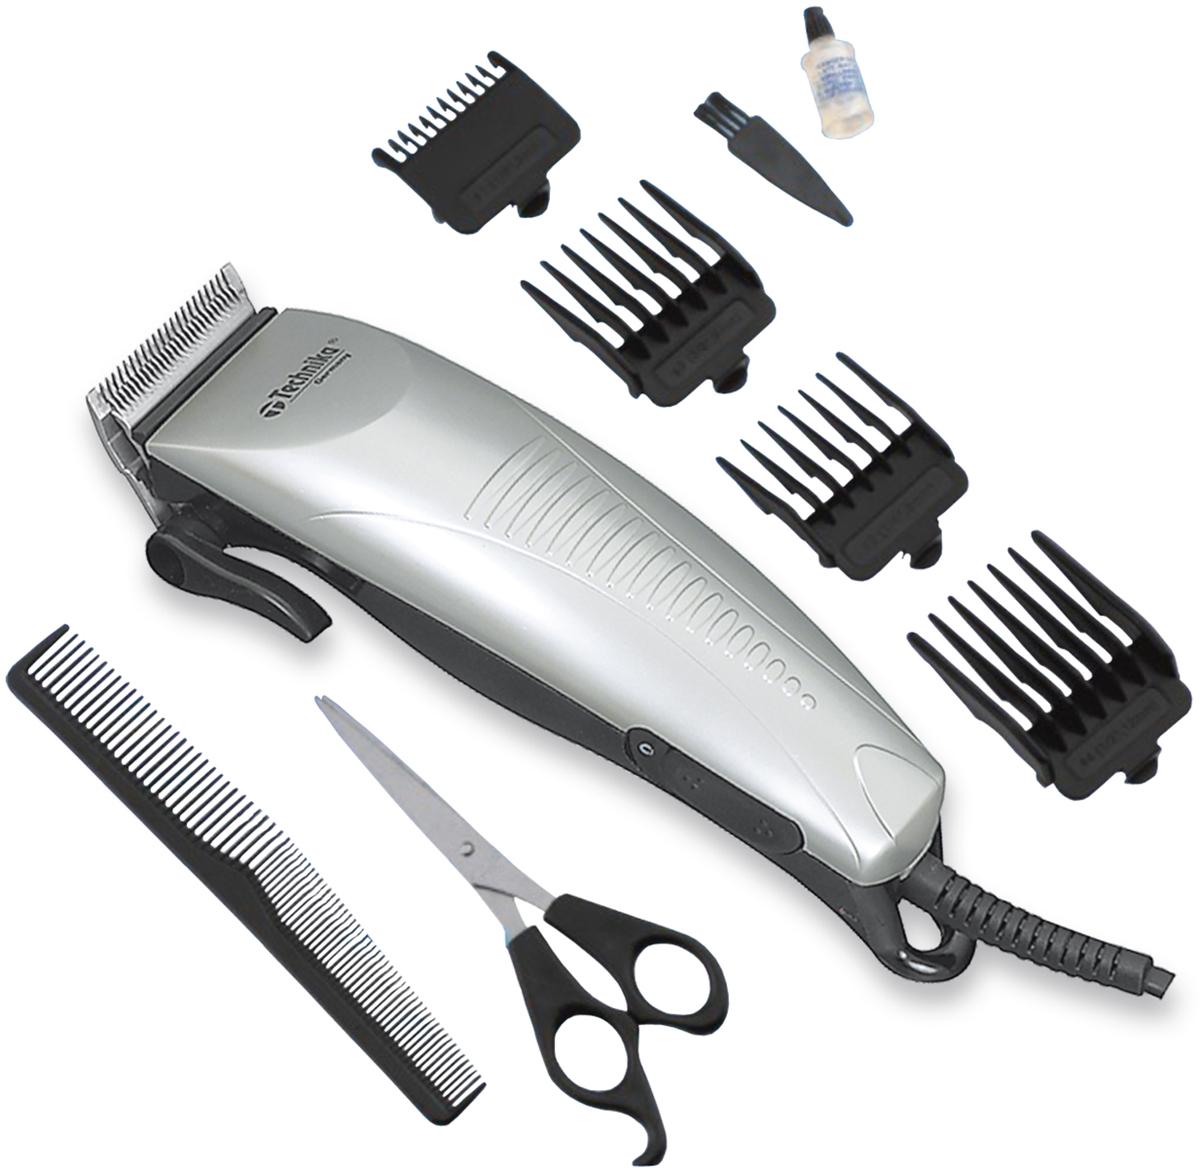 Technika 600 СD, Silver машинка для стрижки машинка для стрижки волос technika tk 600 ab